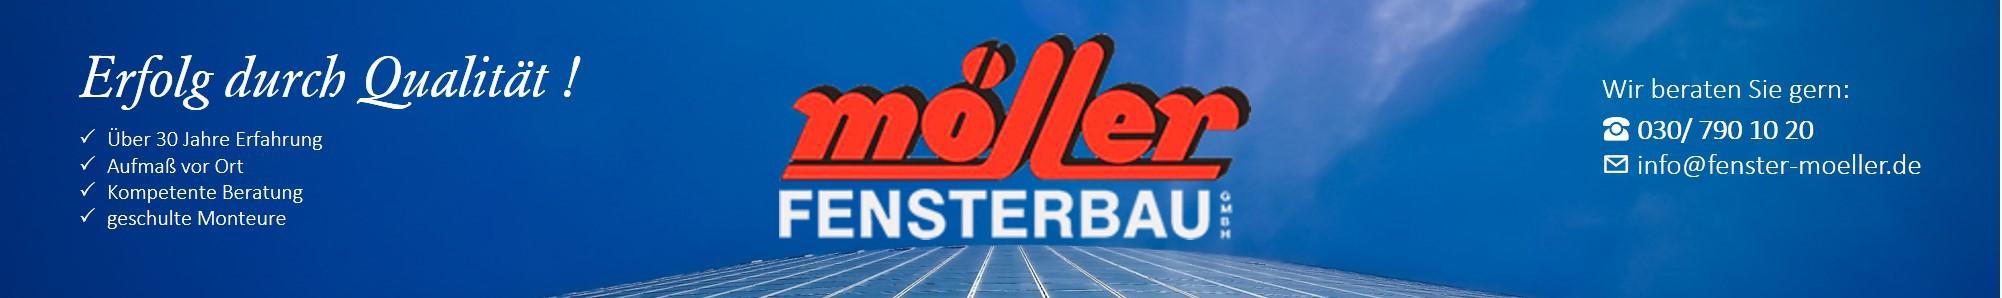 Möller-Fensterbau-Berlin